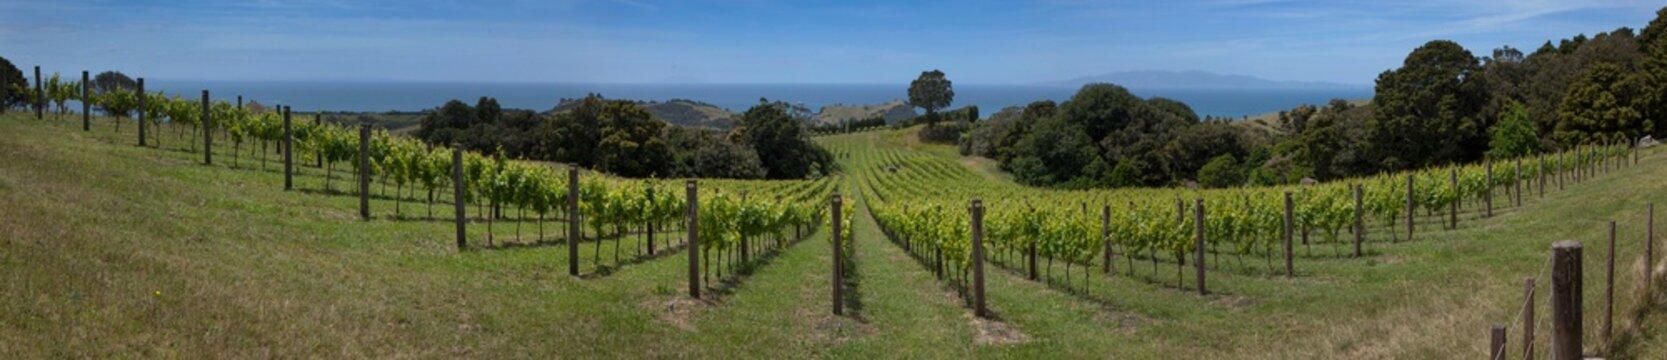 Vineyard Waiheke Island Auckland